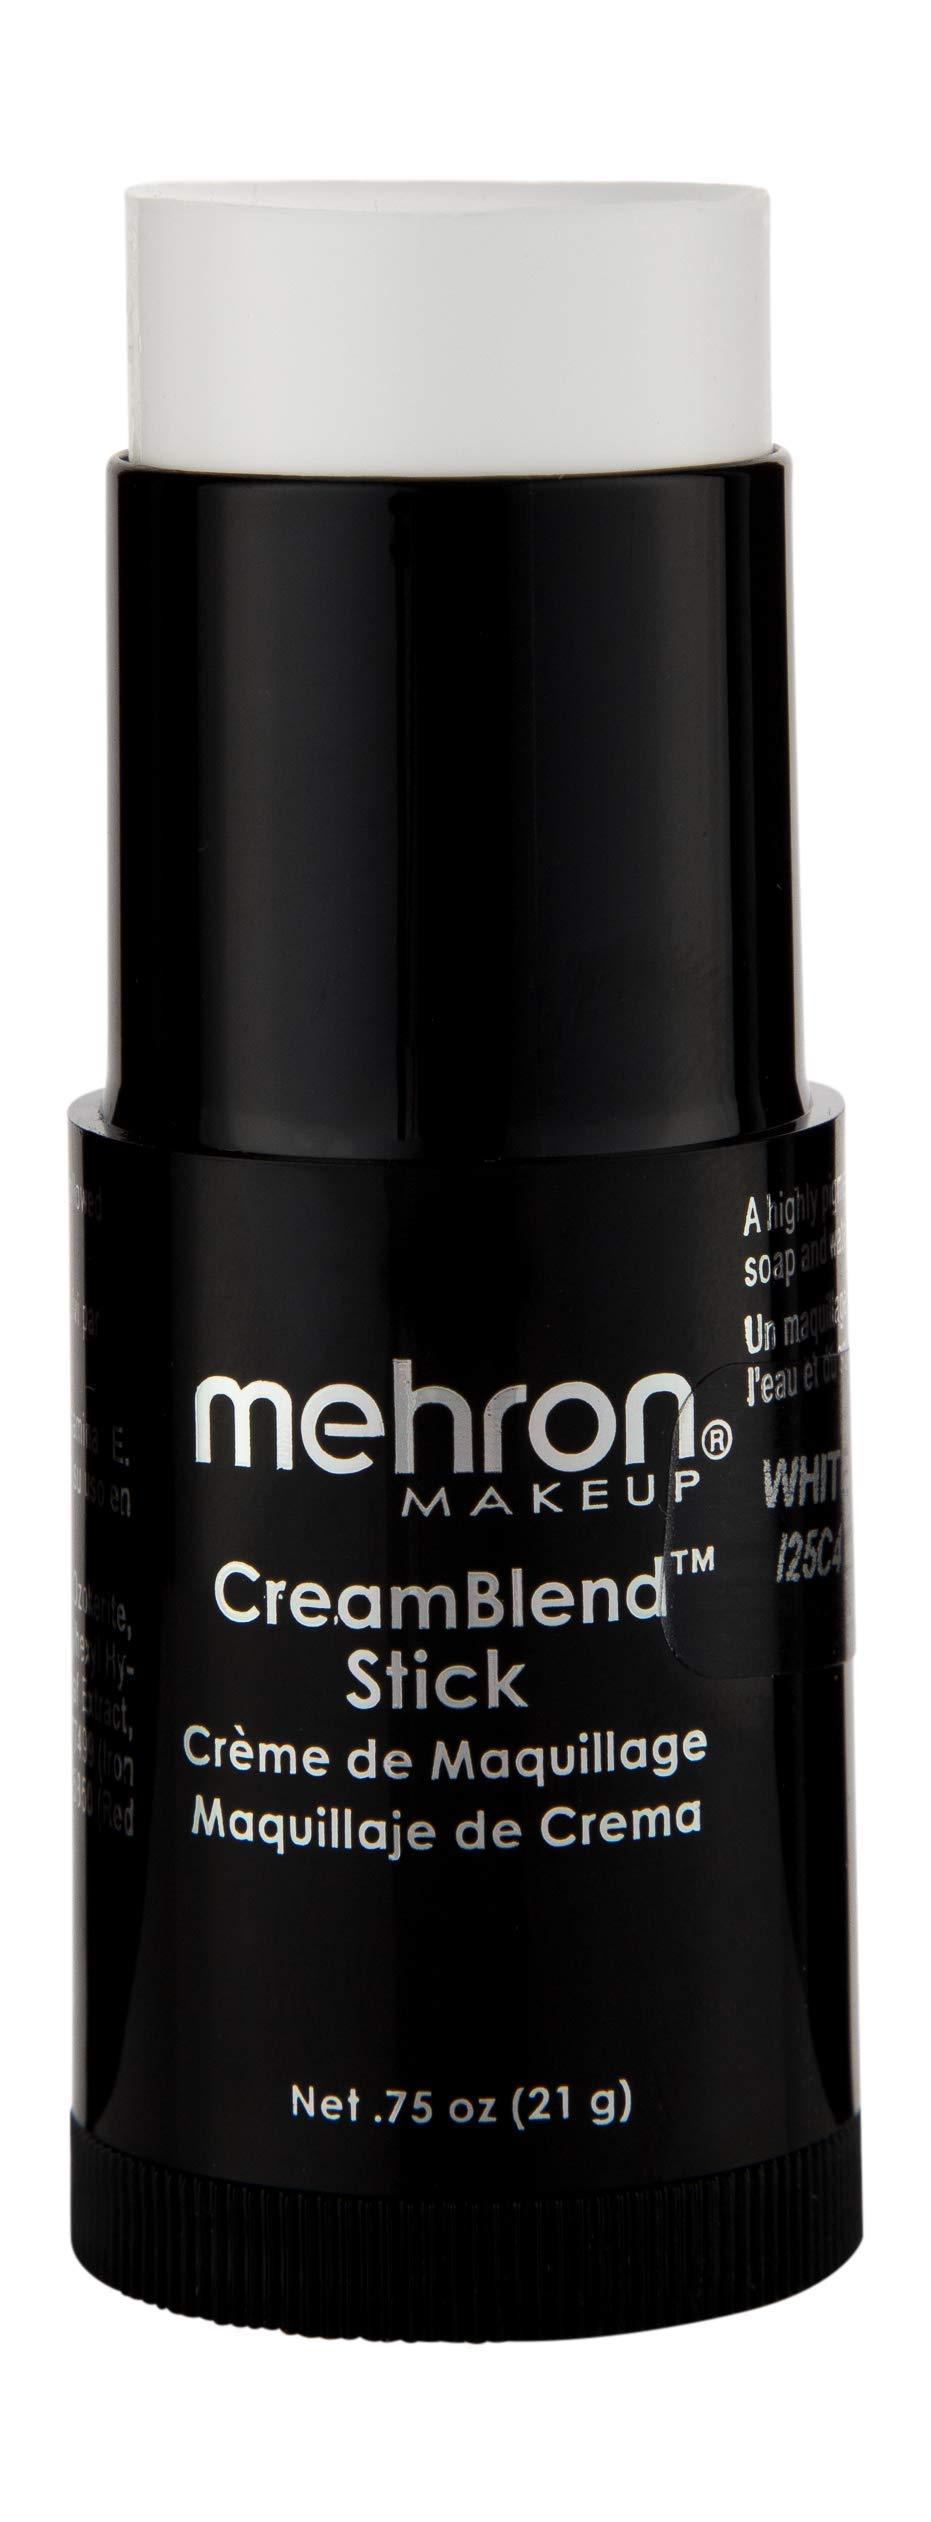 Mehron Makeup CreamBlend Stick (0.75 Ounce) (White) by Mehron